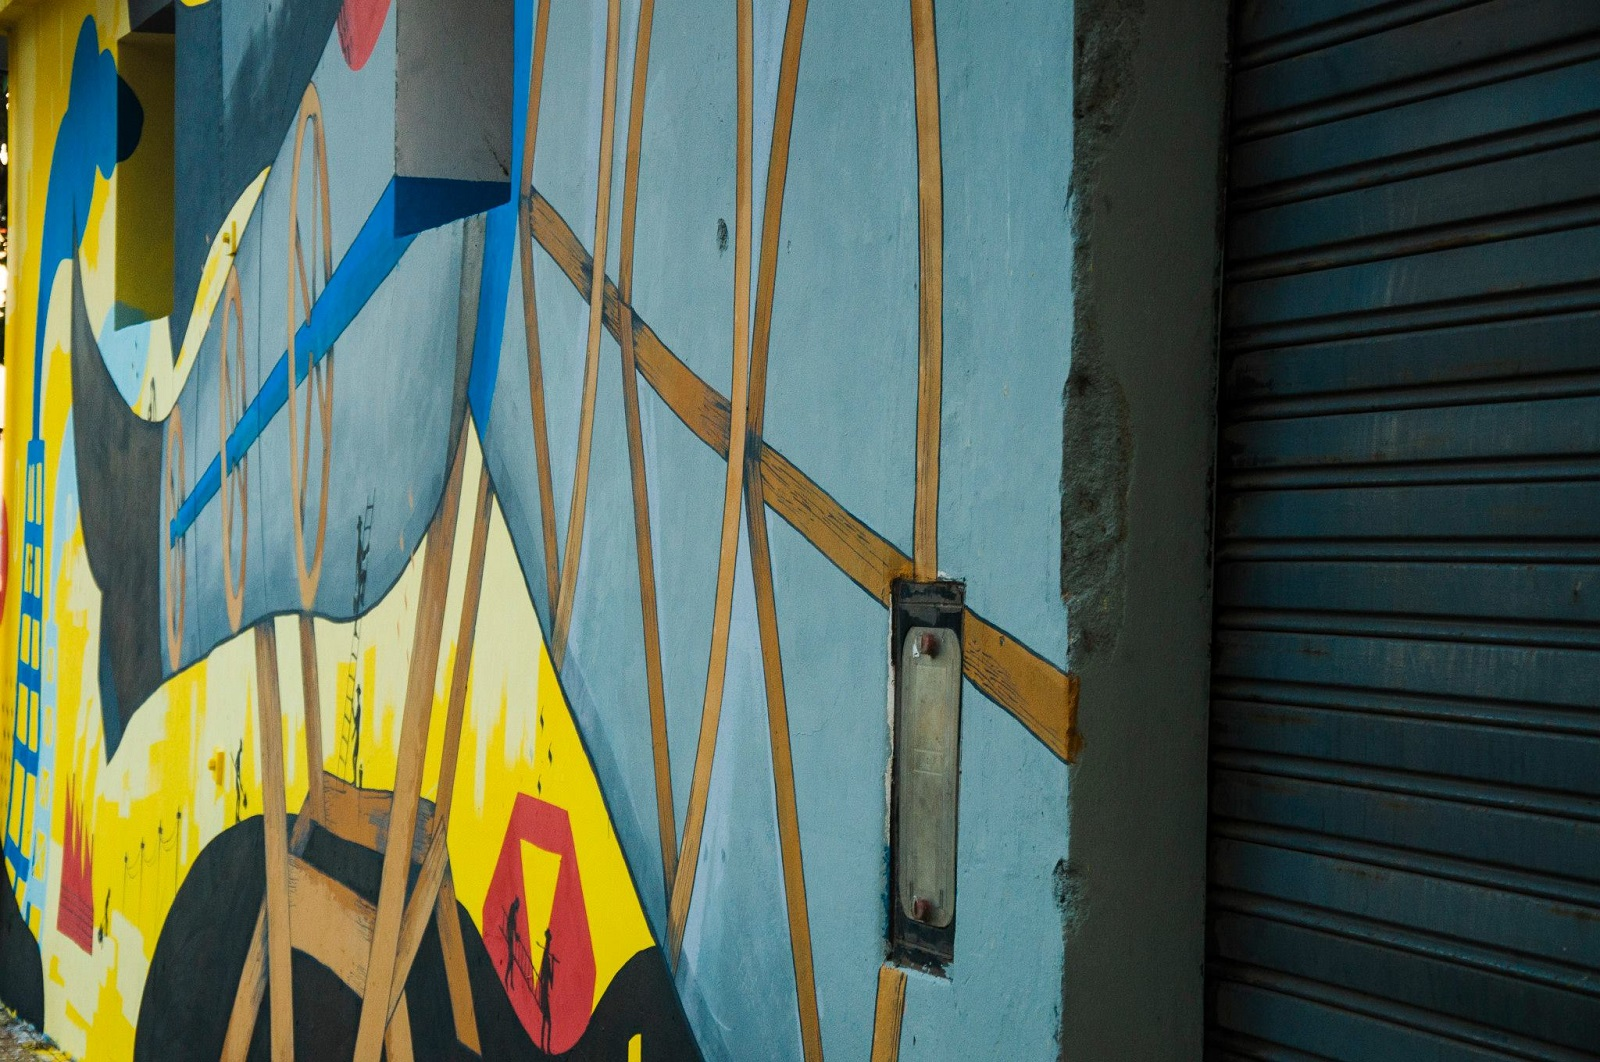 pedro-perelman-new-mural-for-oficio-residence-11